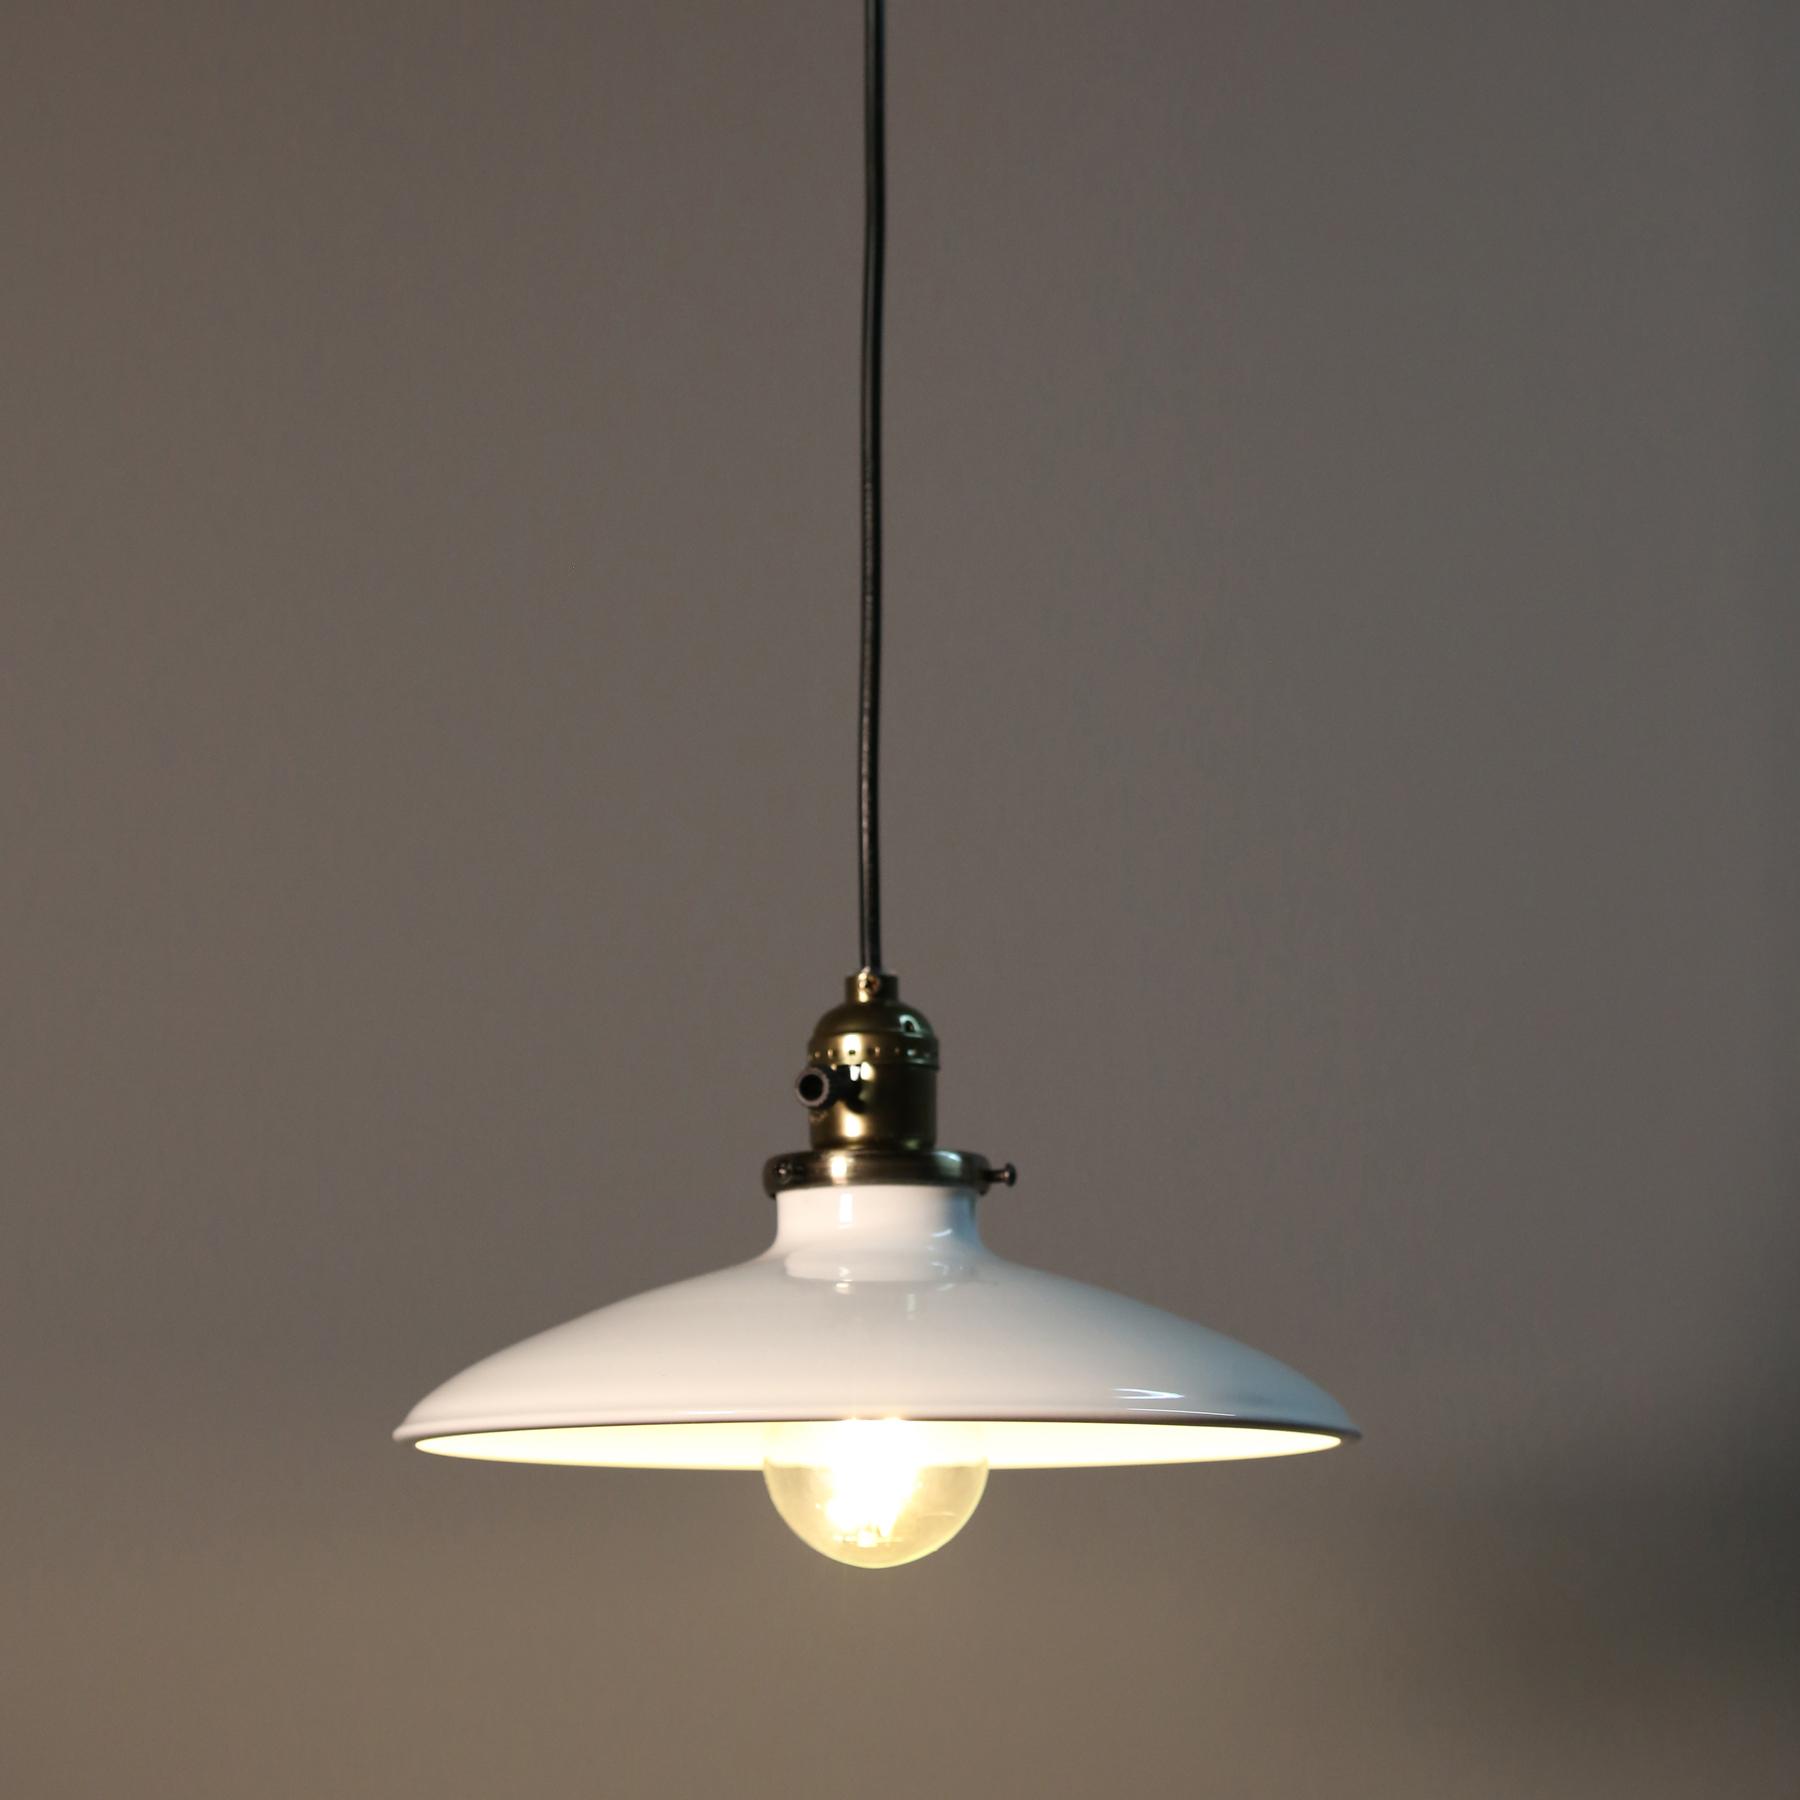 Yeelight Smart LED-lamppu filamentti 5 kpl